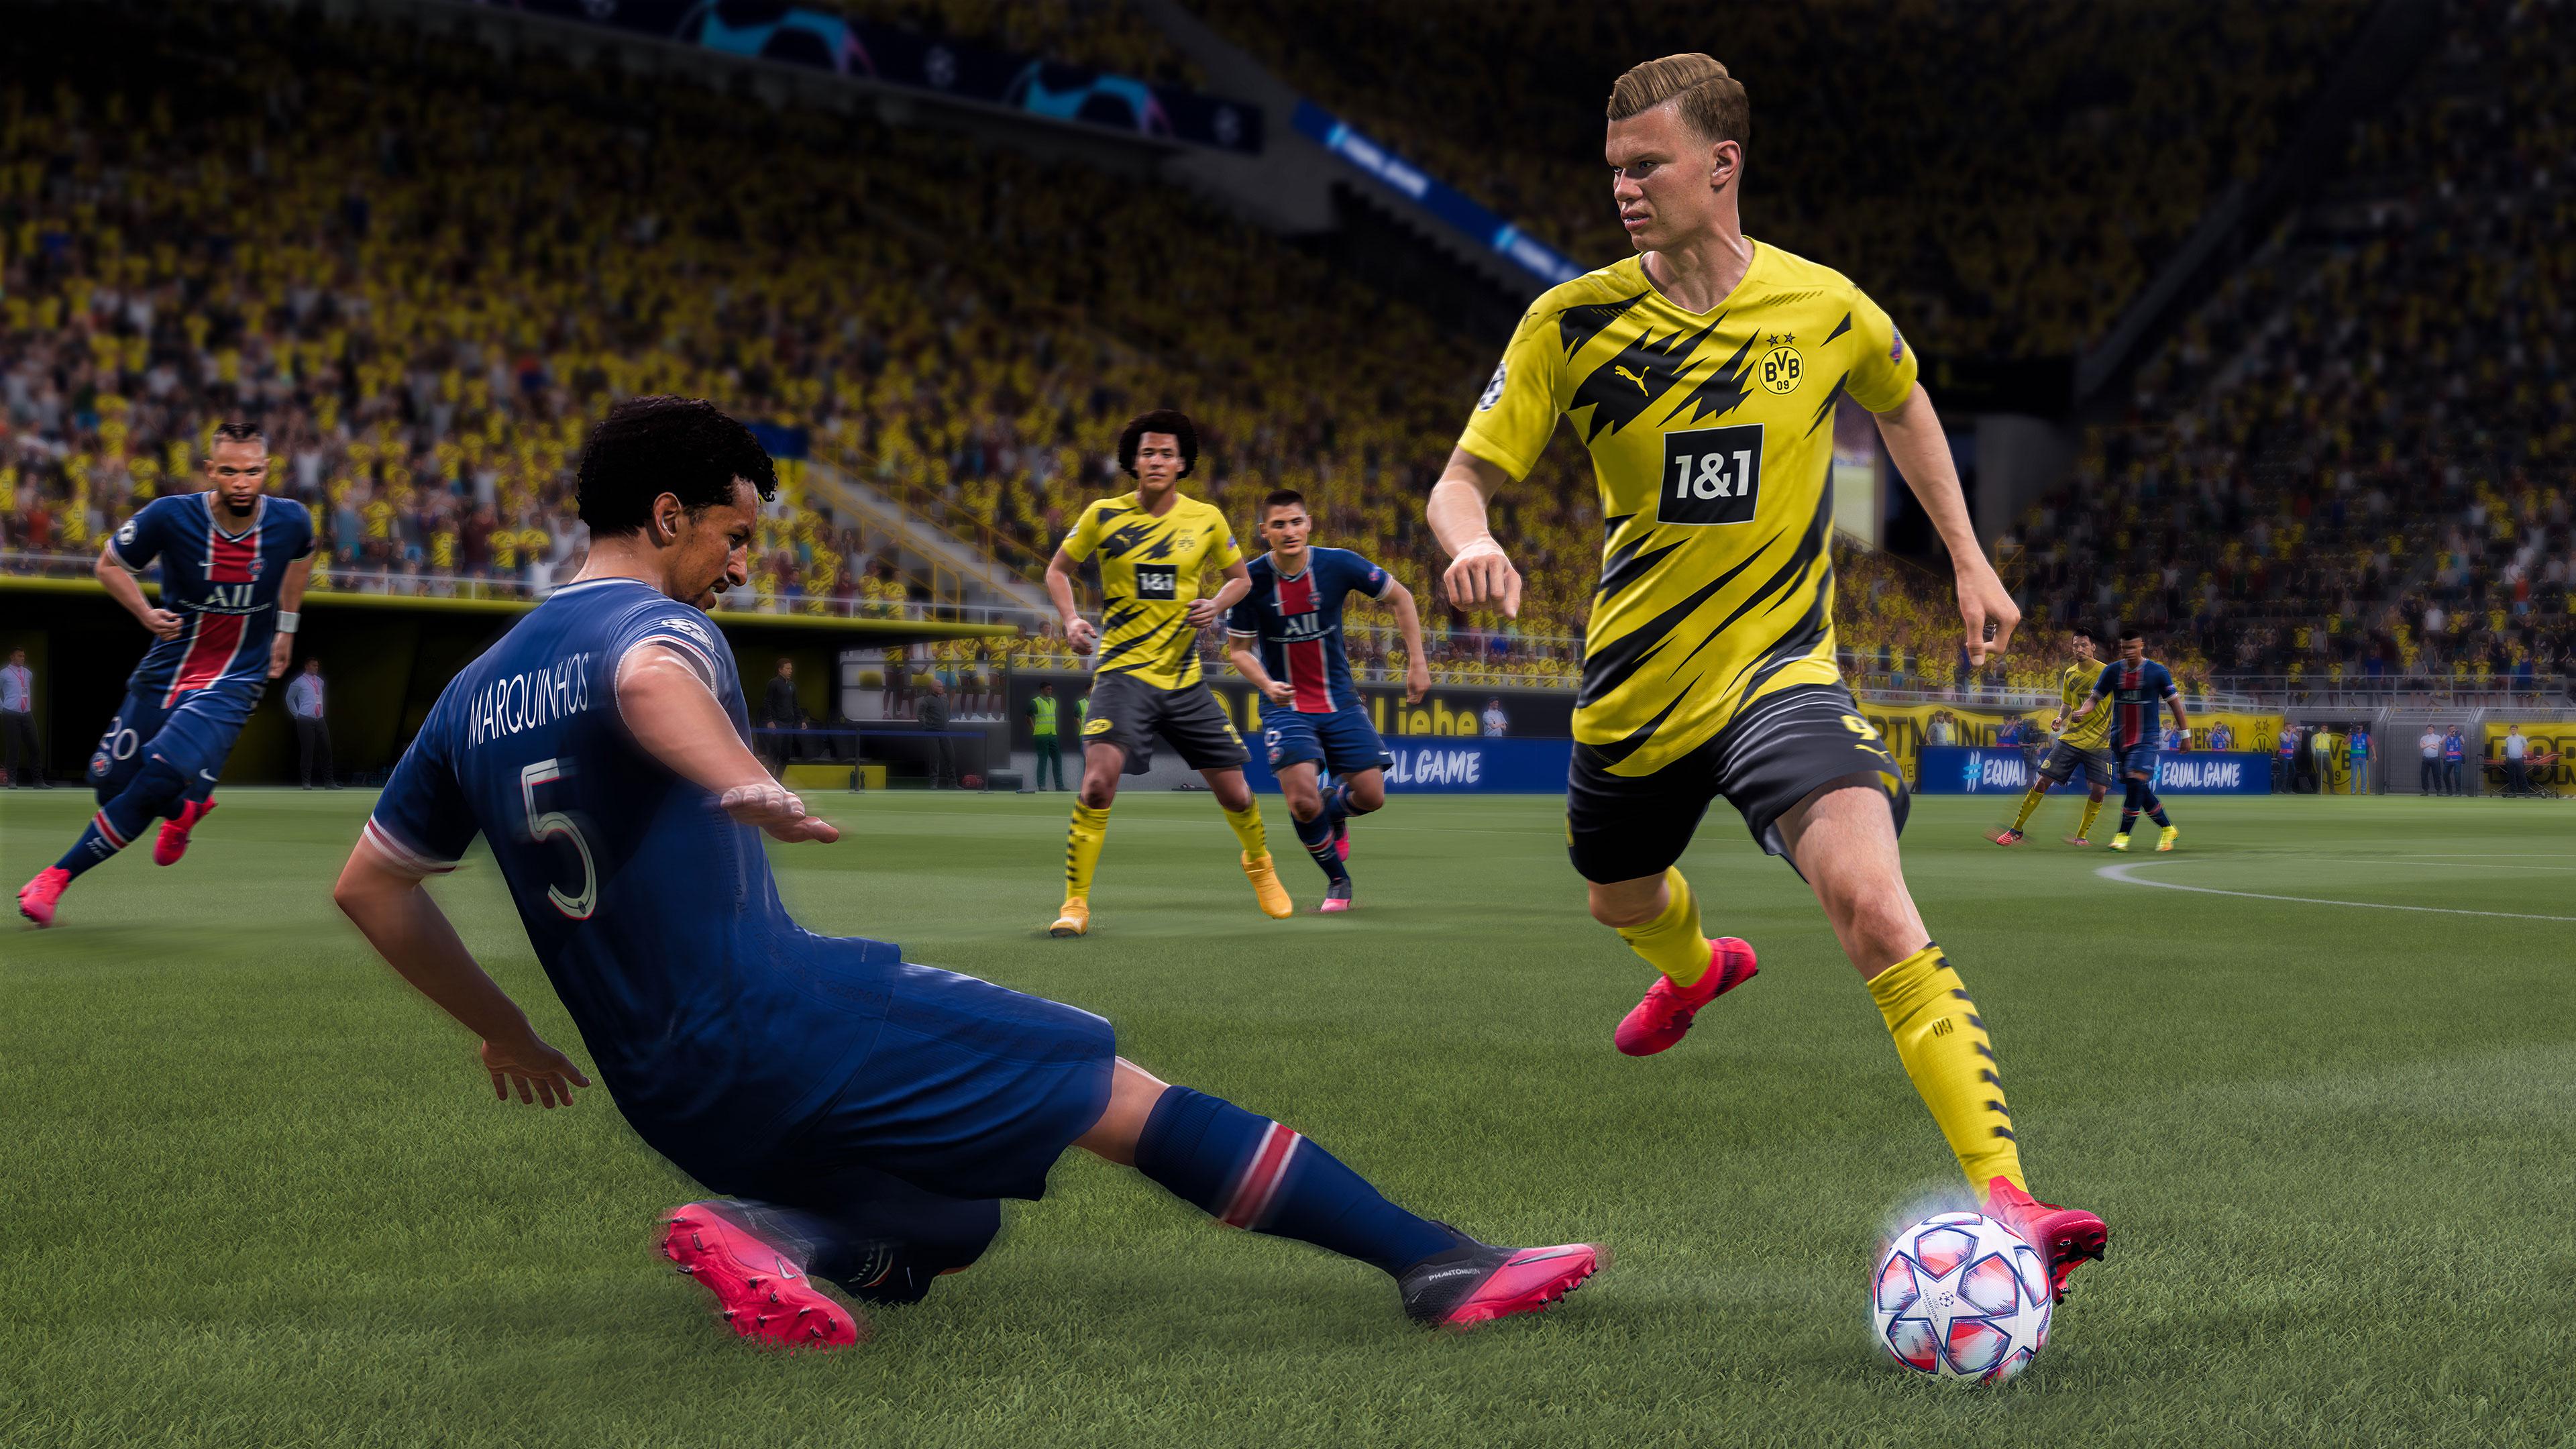 Скриншот №4 к FIFA 21 издание Champions PS4 and PS5